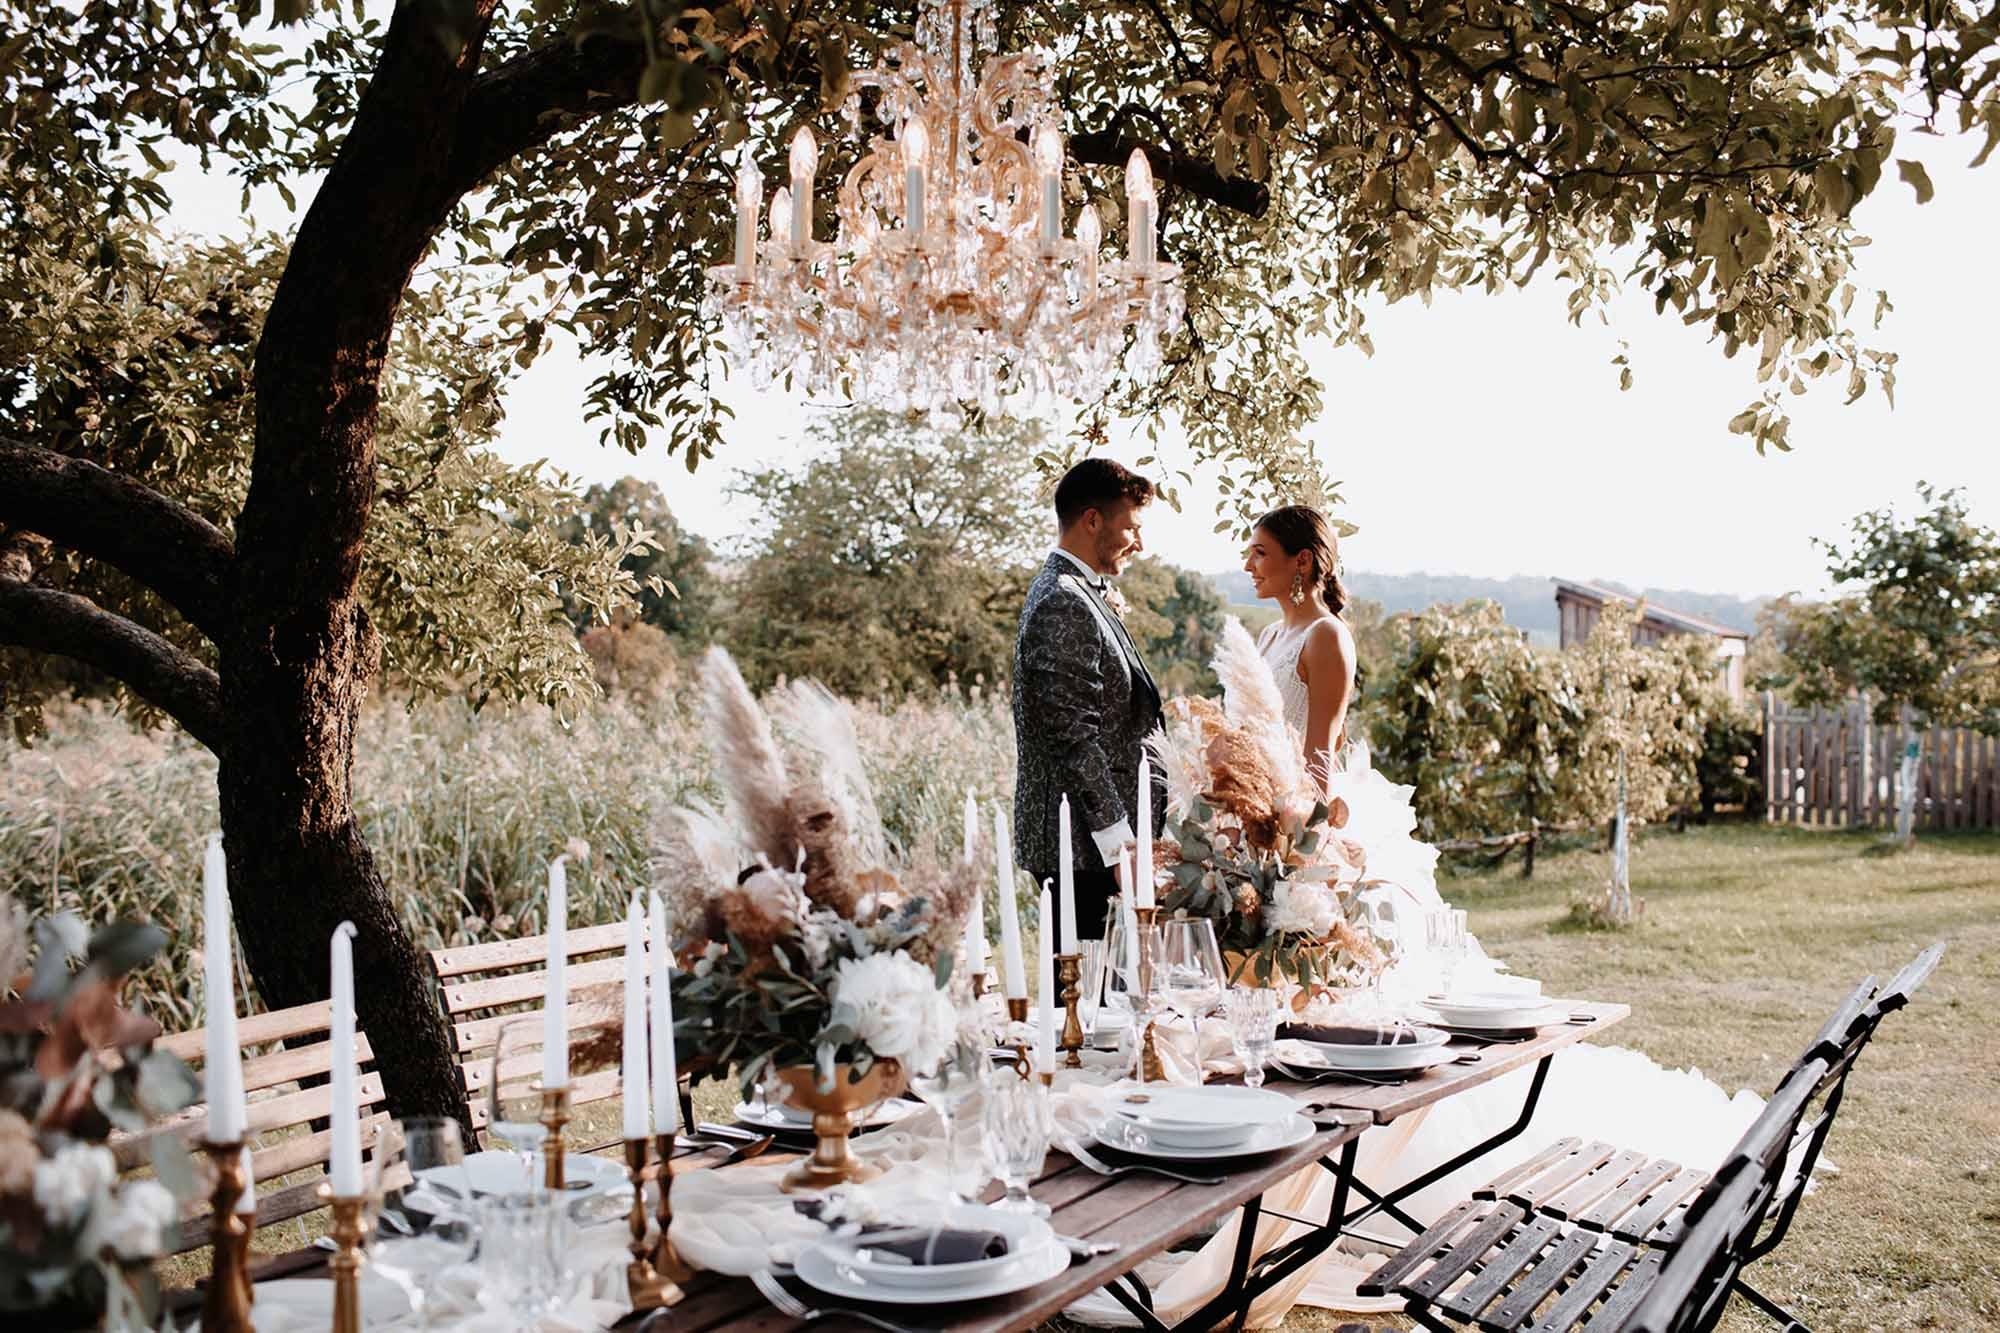 Exclusive Weddings & Events